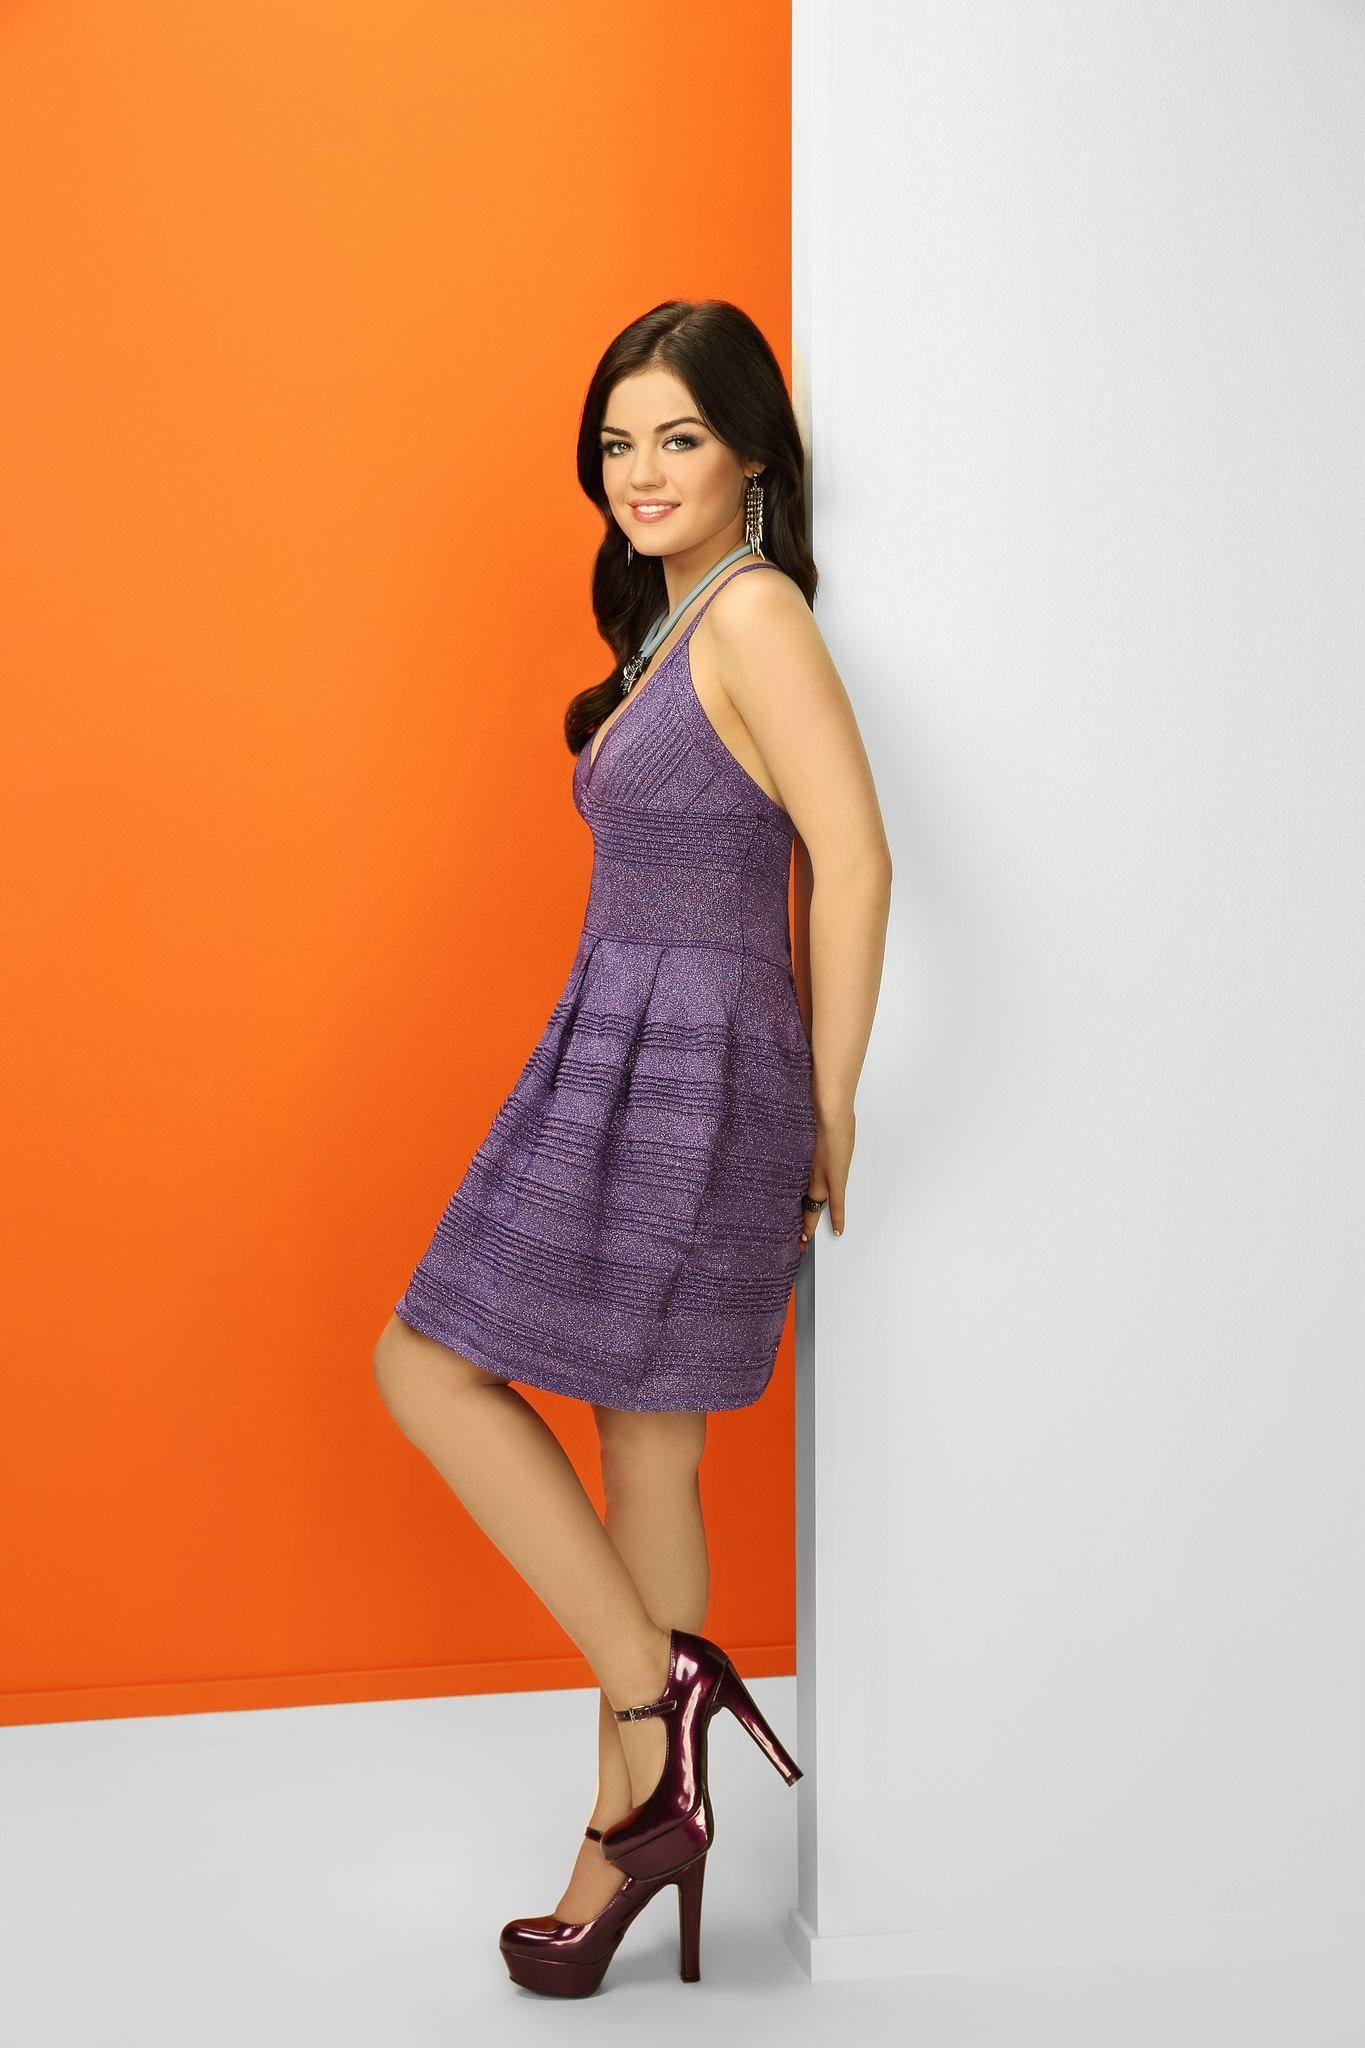 1010499 10151477133220233 315908353 N Random Swag Pinterest Pensil Alis Shopie Paris Lucy Hale Aria Montgomery Wears Purple Dress During Pretty Little Liars Season 4 Promo Shoot